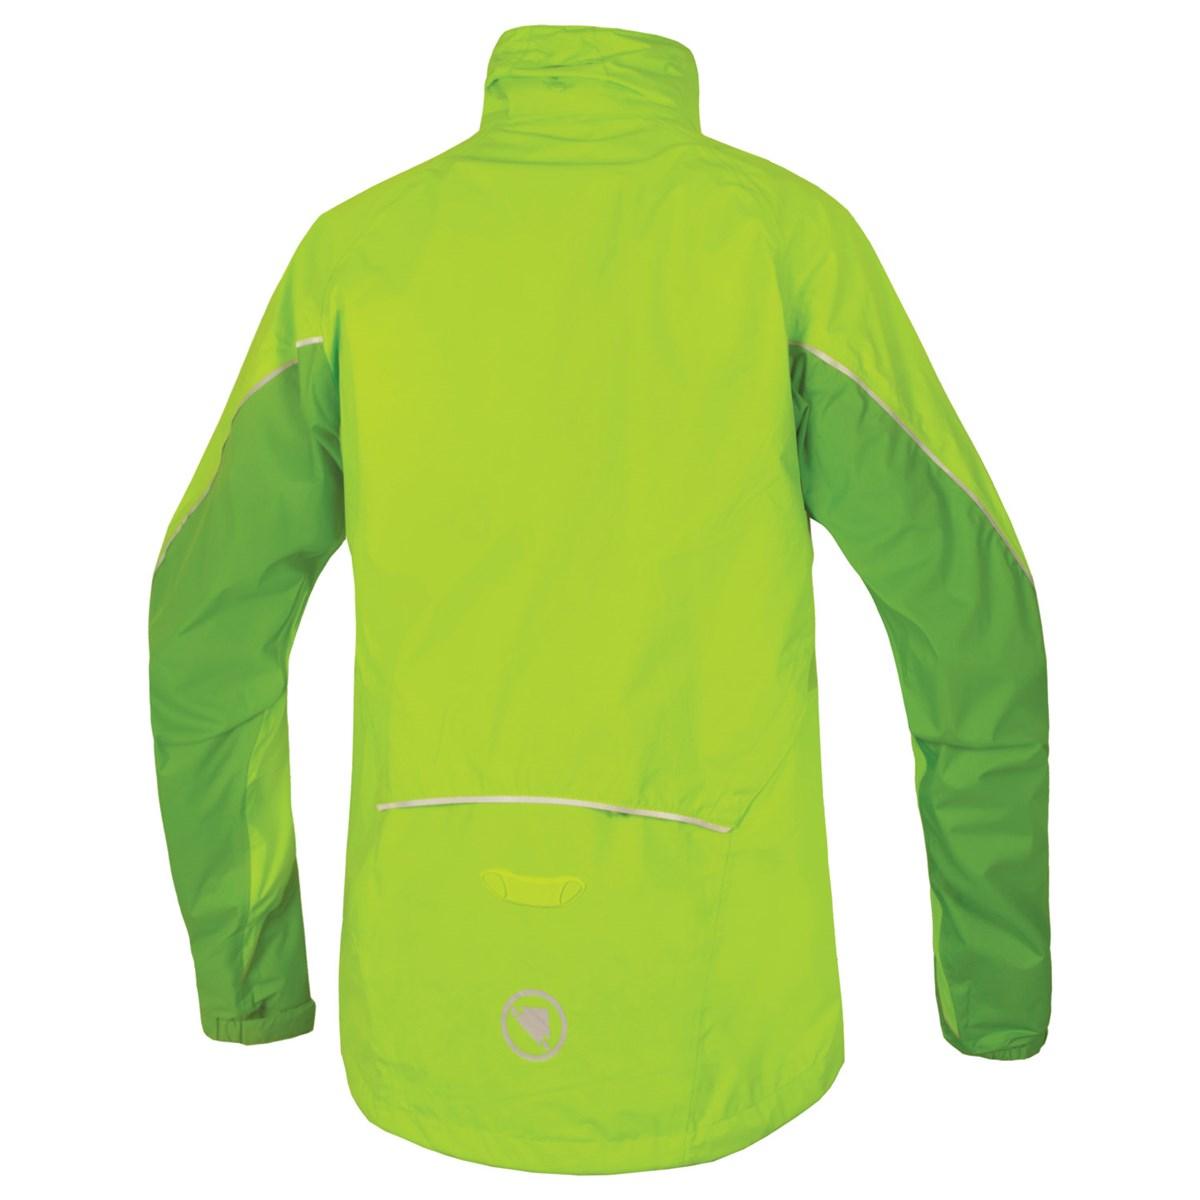 d4c43fef1 Endura Hummvee Convertible Kelly Green Waterproof Cycling Jacket £99.99